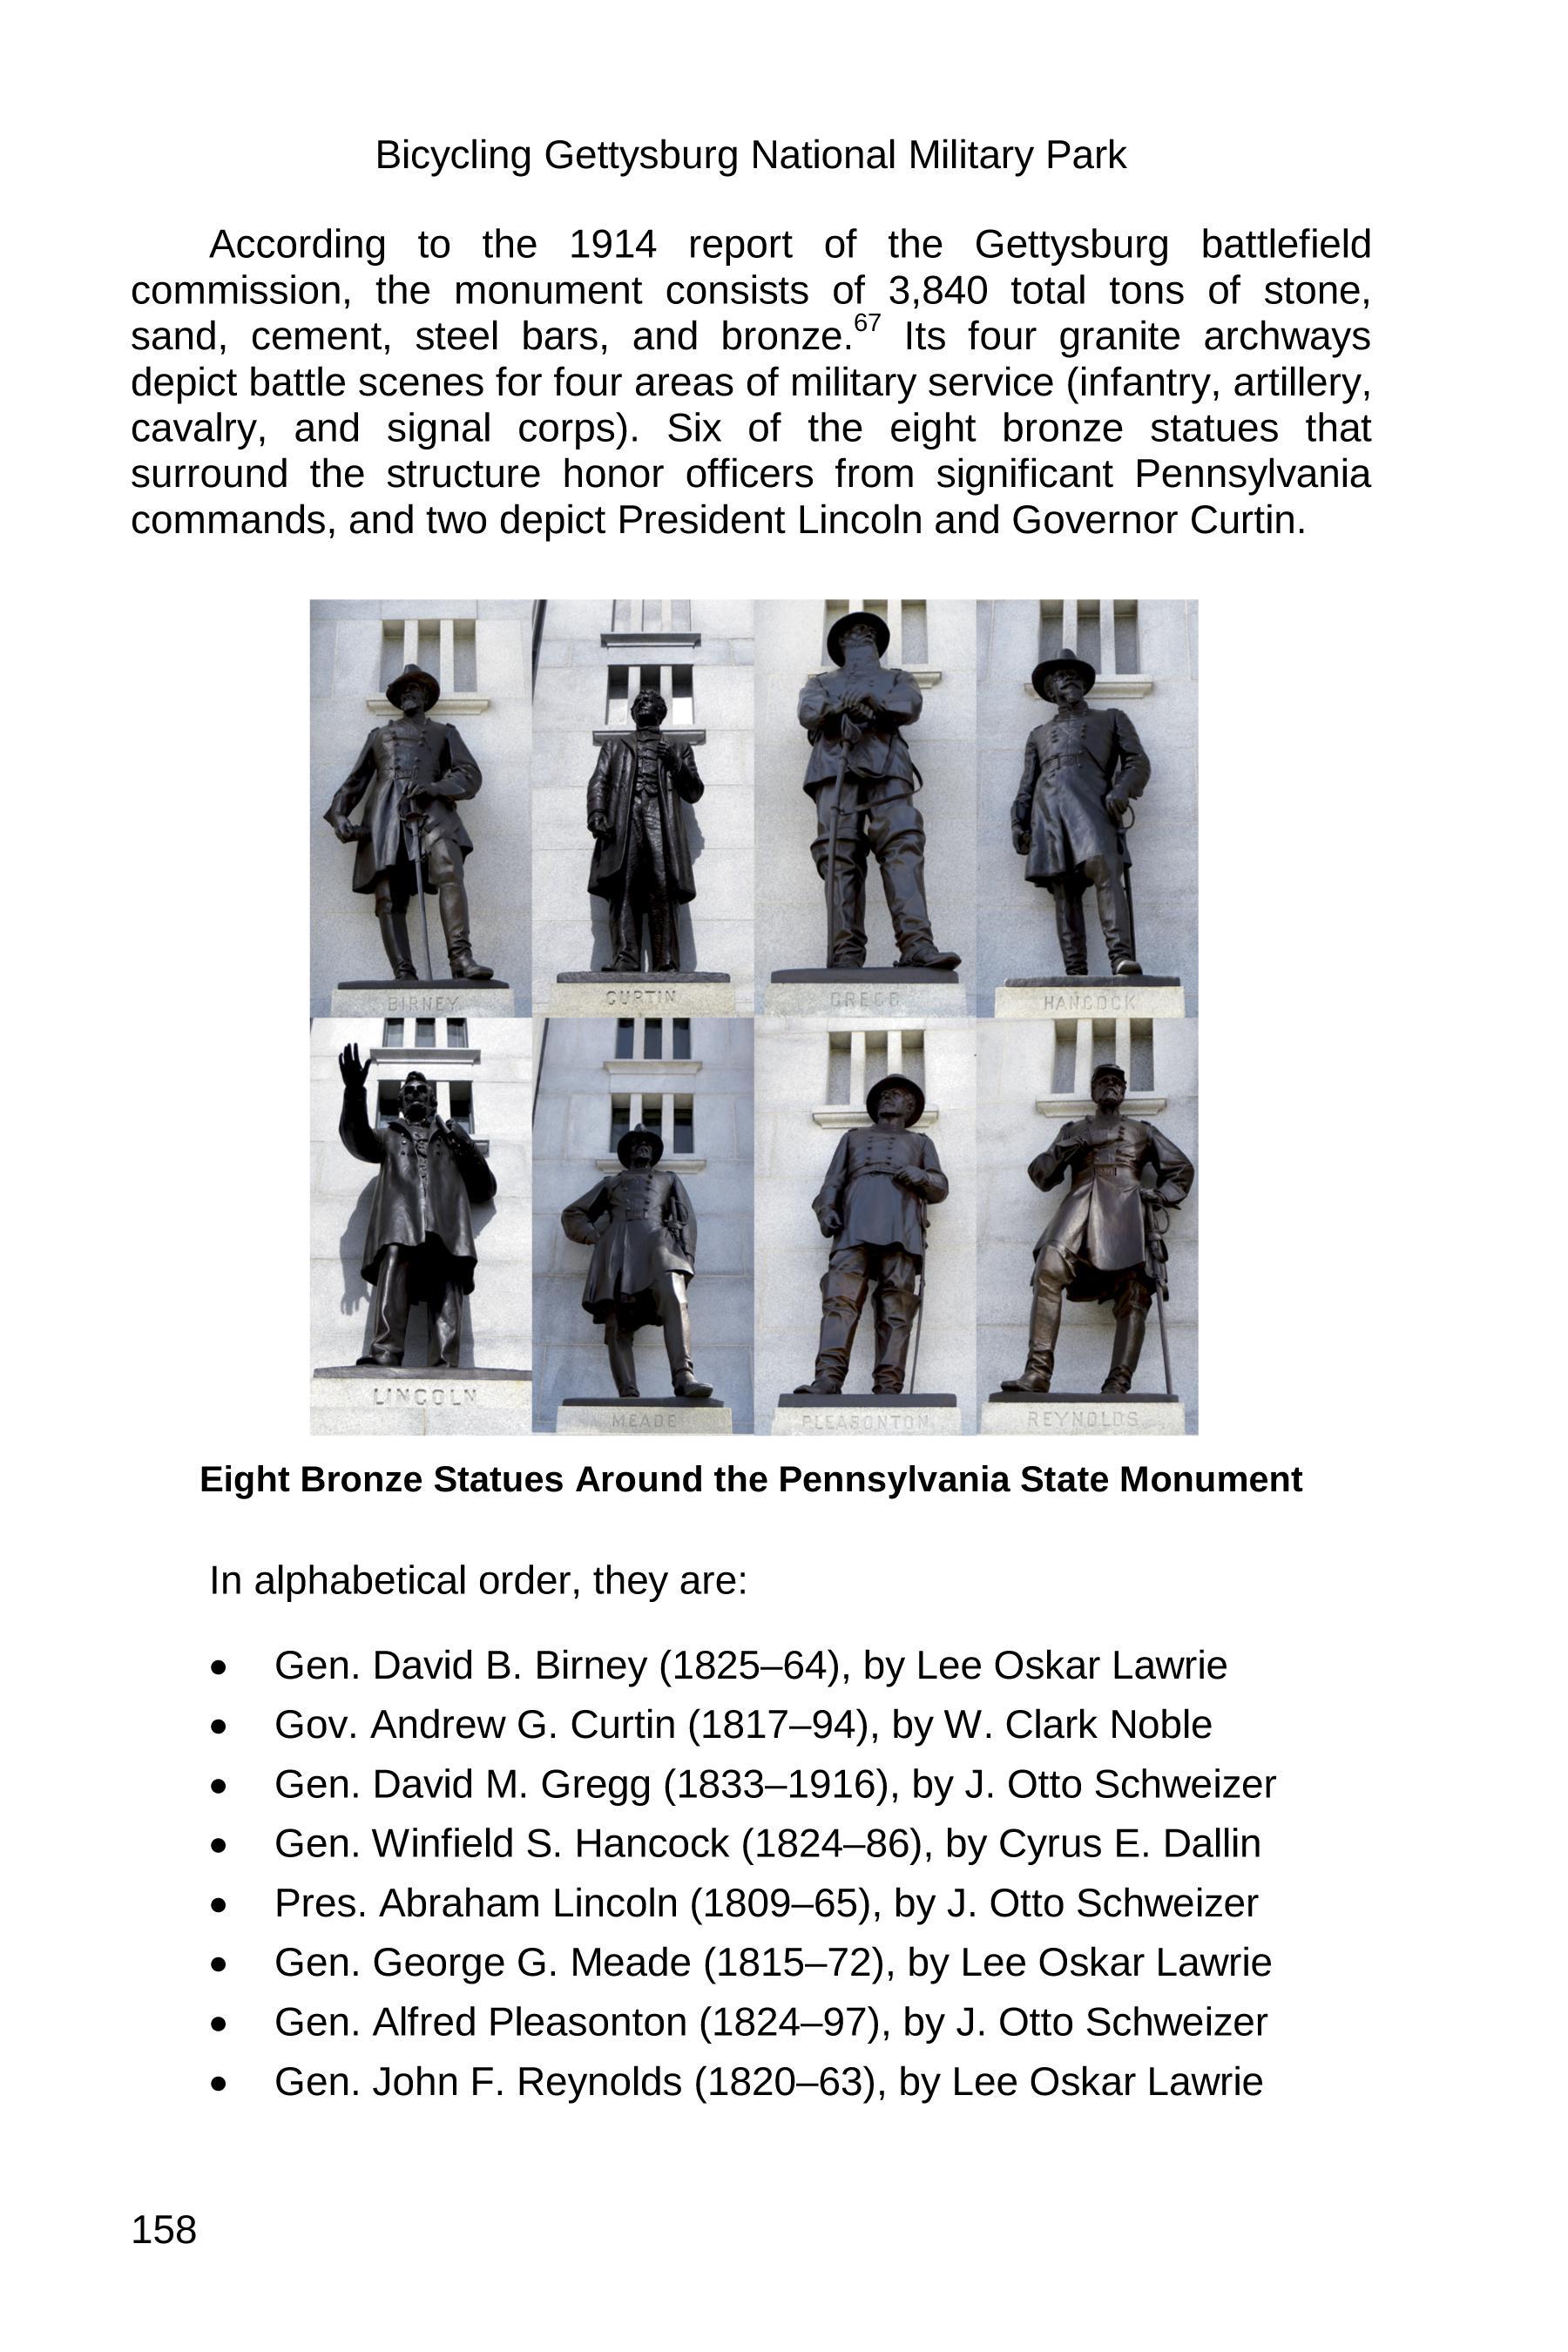 gettysburg state monuments sample 158